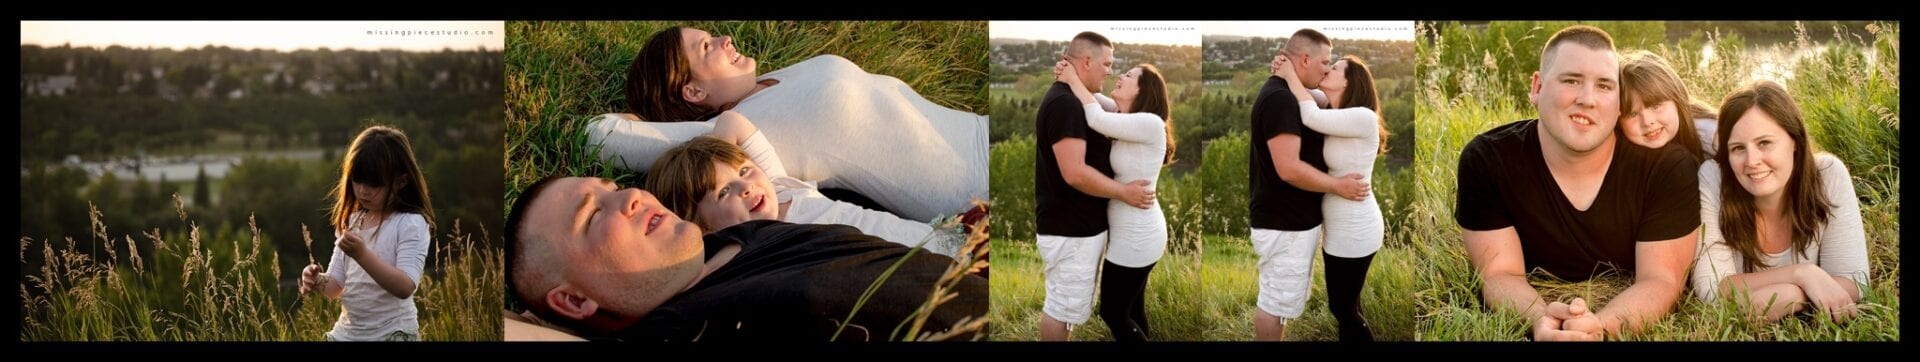 Edmonton Family Portrait Photography Candid-collage017